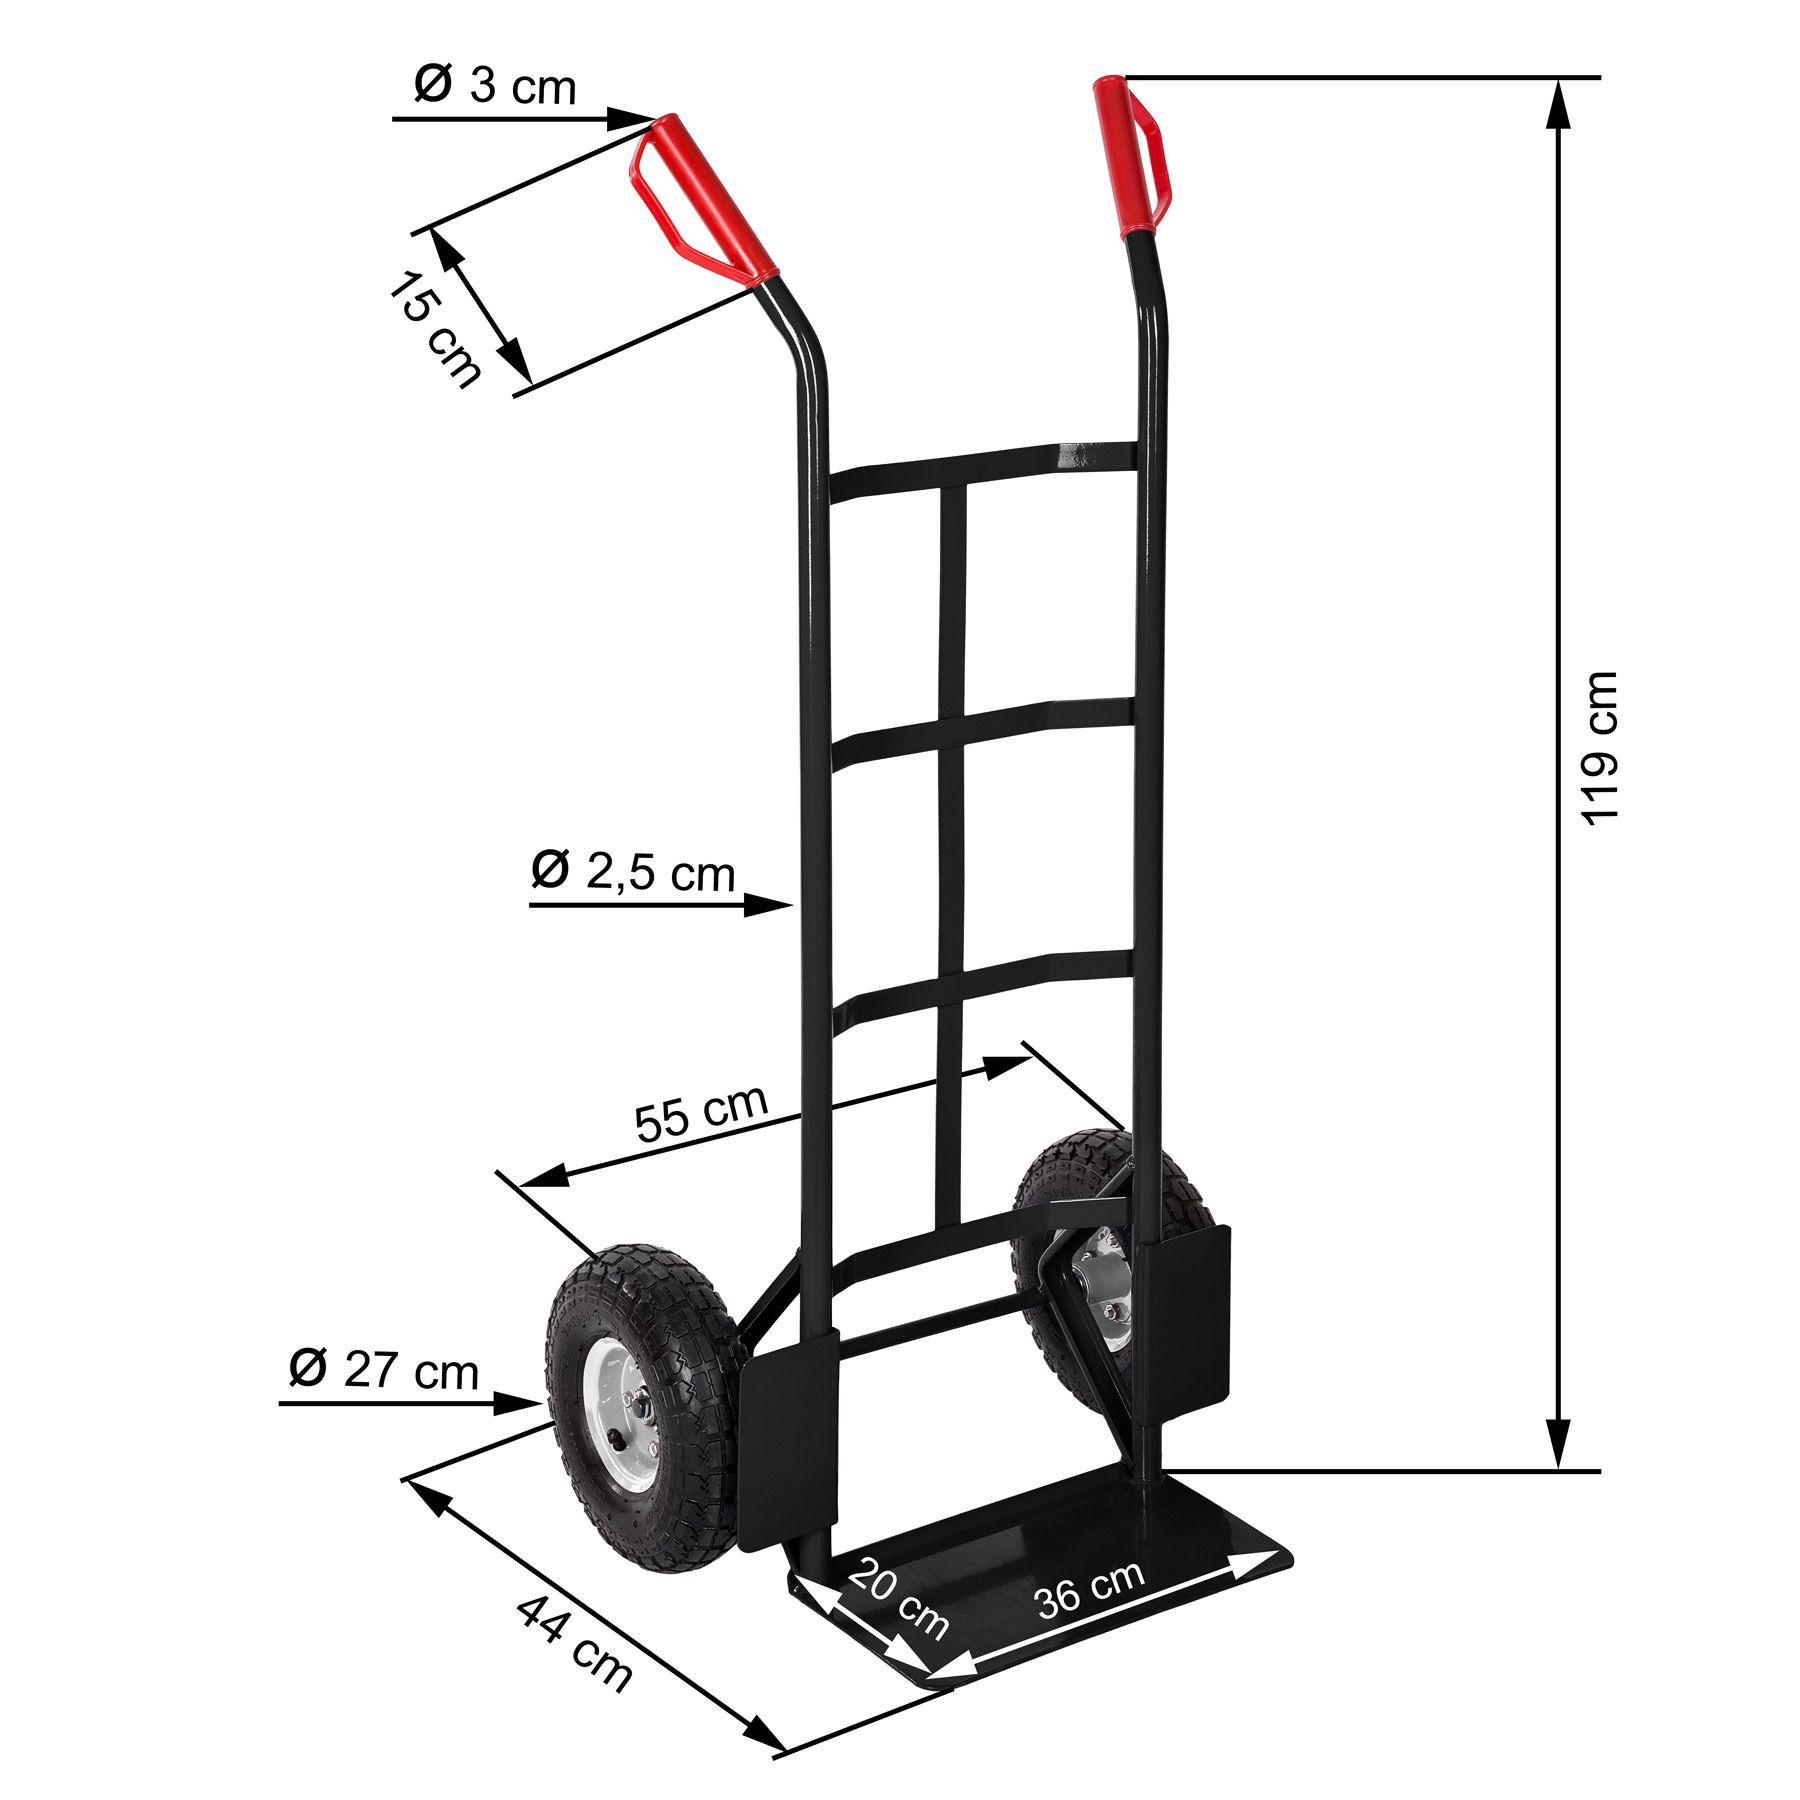 profi sackkarre transportkarre stapelkarre 200kg 4260182874554 ebay. Black Bedroom Furniture Sets. Home Design Ideas